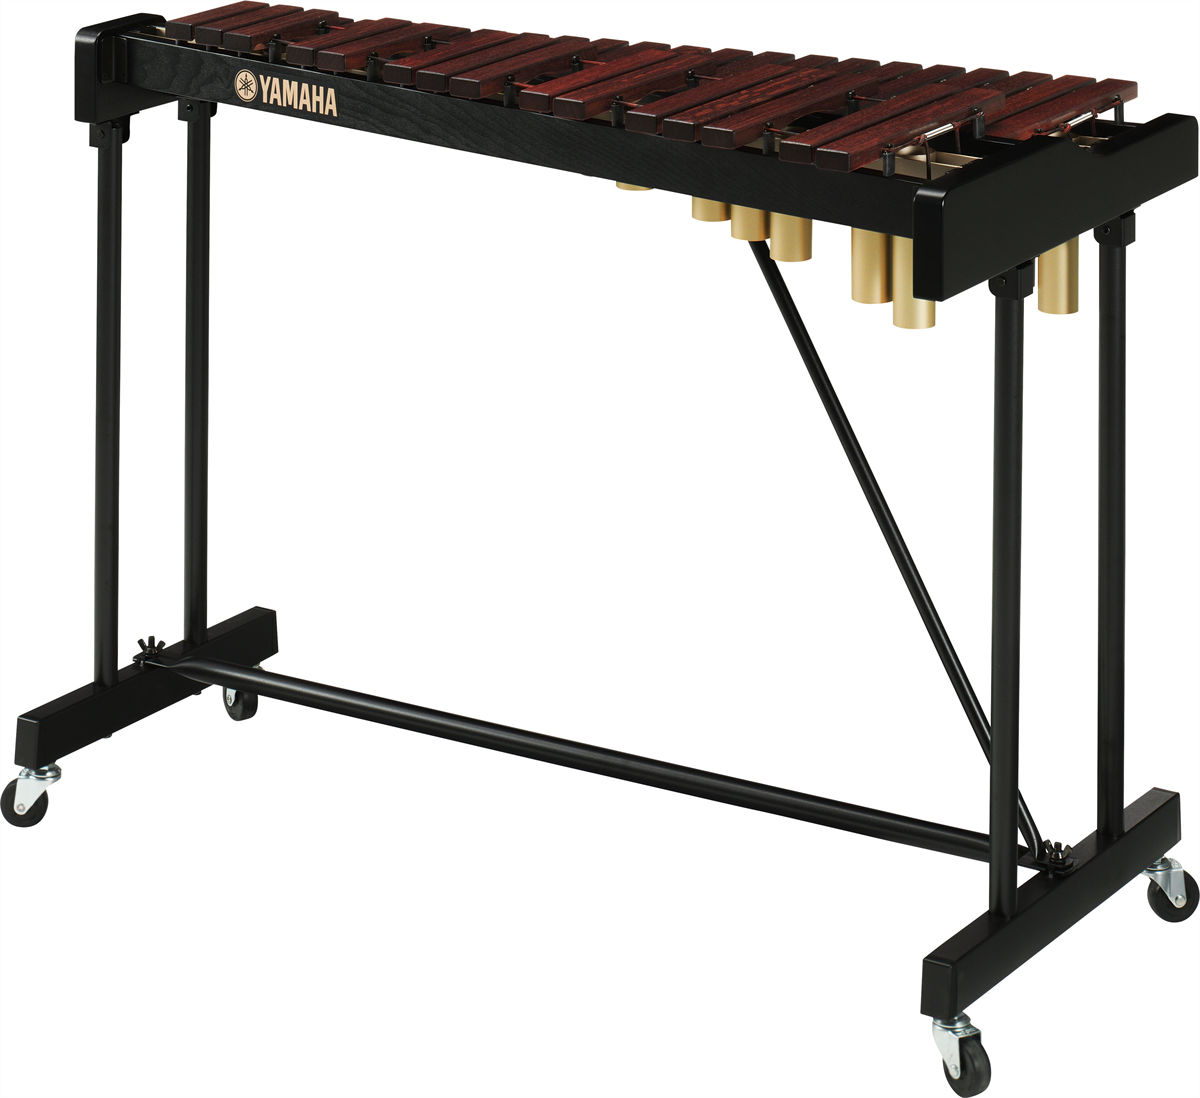 Yamaha YX-30G Xylofoon